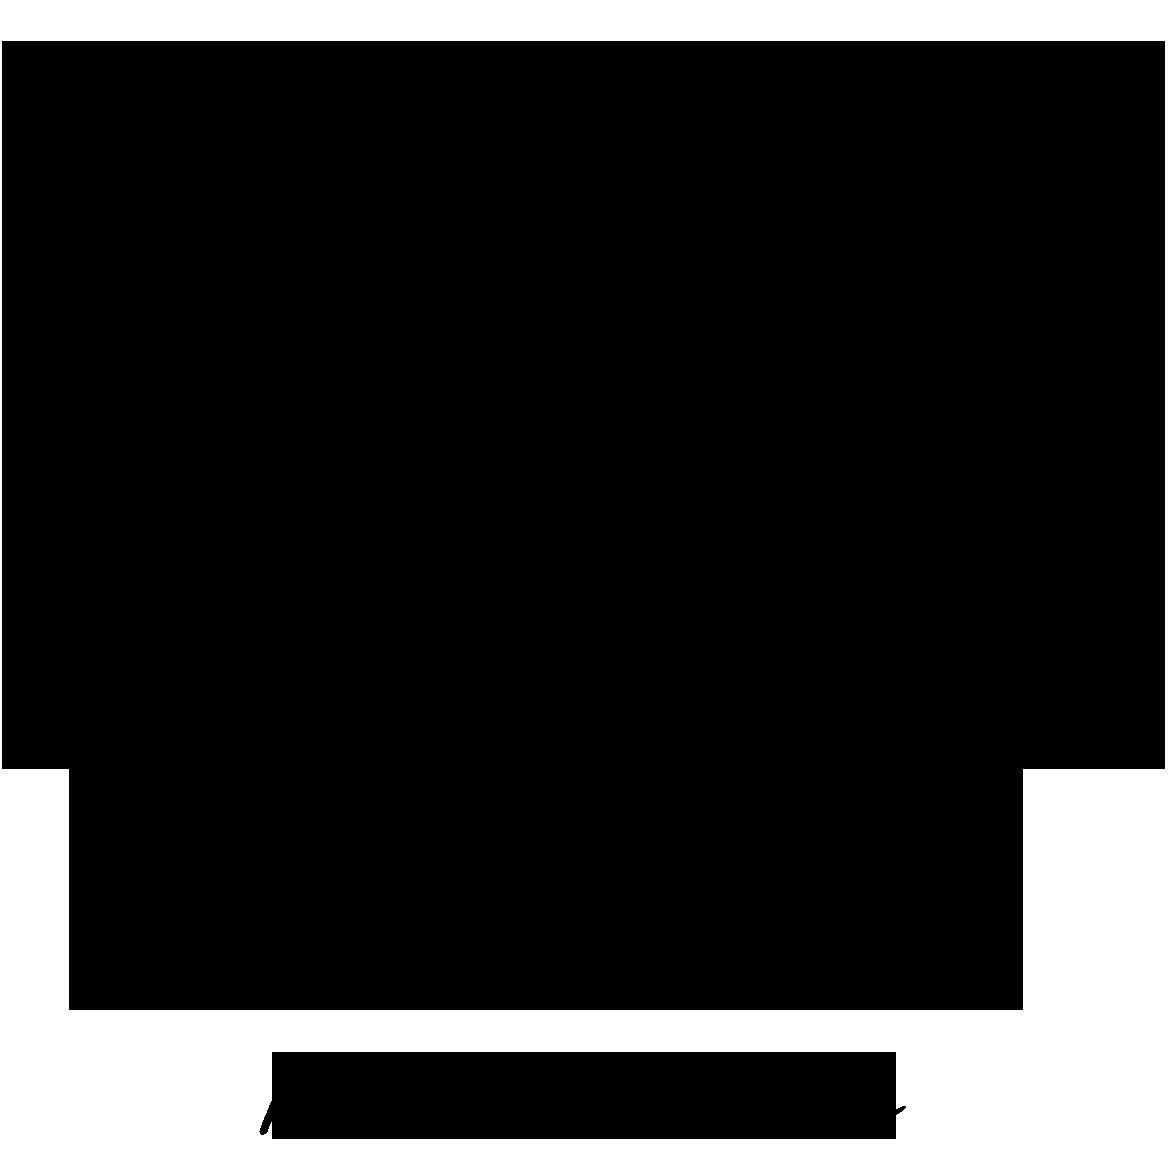 Malu_logo_2